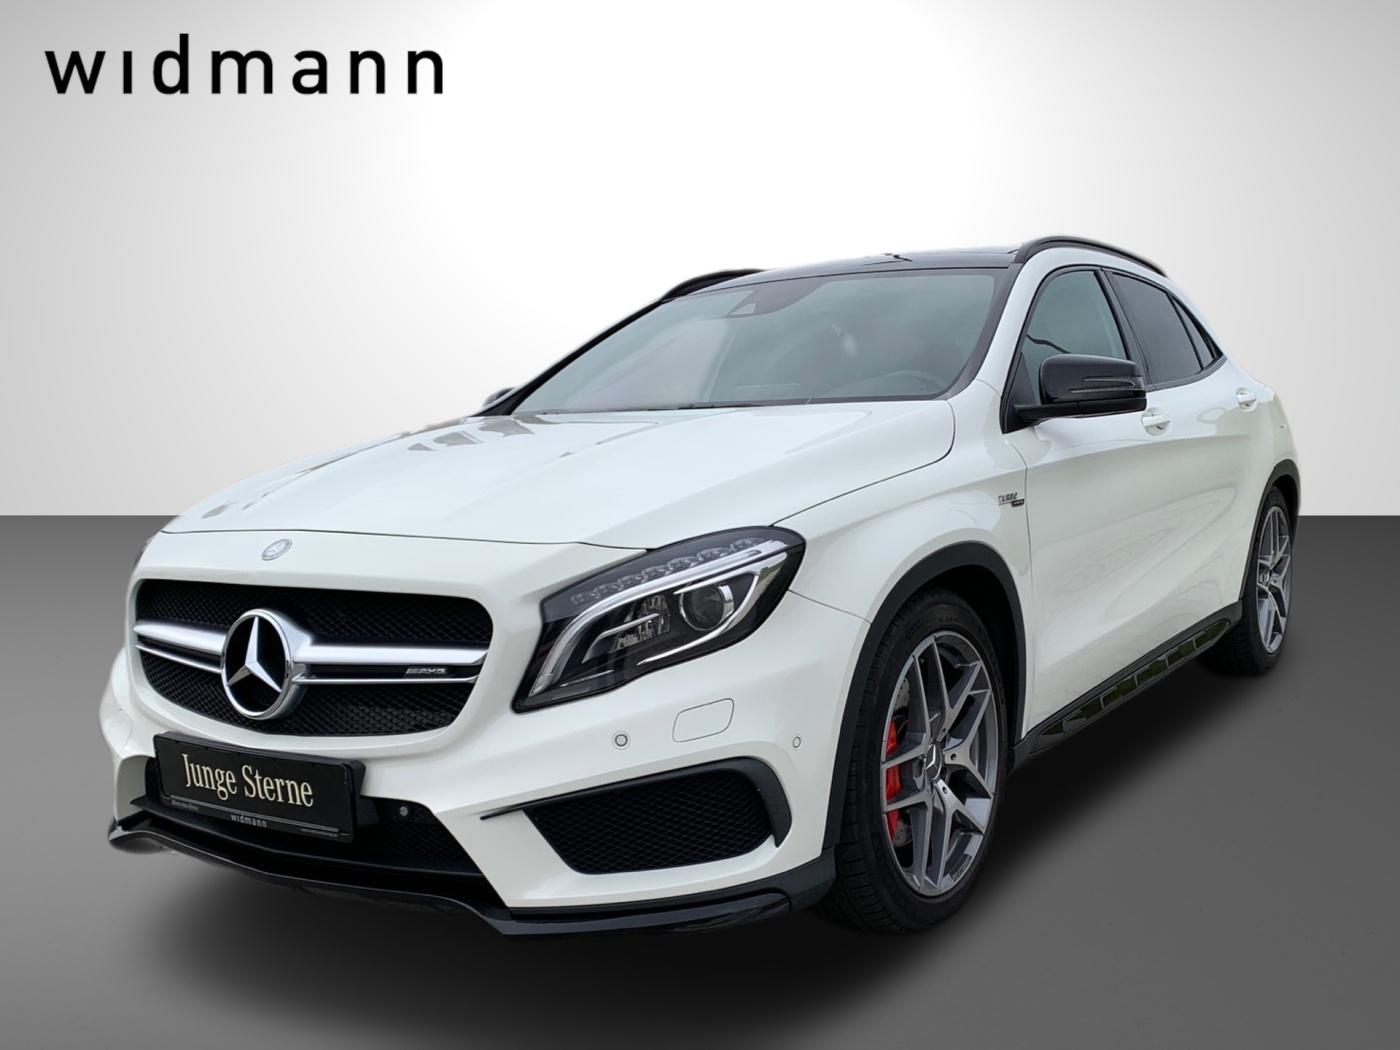 Mercedes-Benz GLA 45 AMG 4M Designo*Comand*Pano.-Dach*Sport-AG, Jahr 2015, Benzin